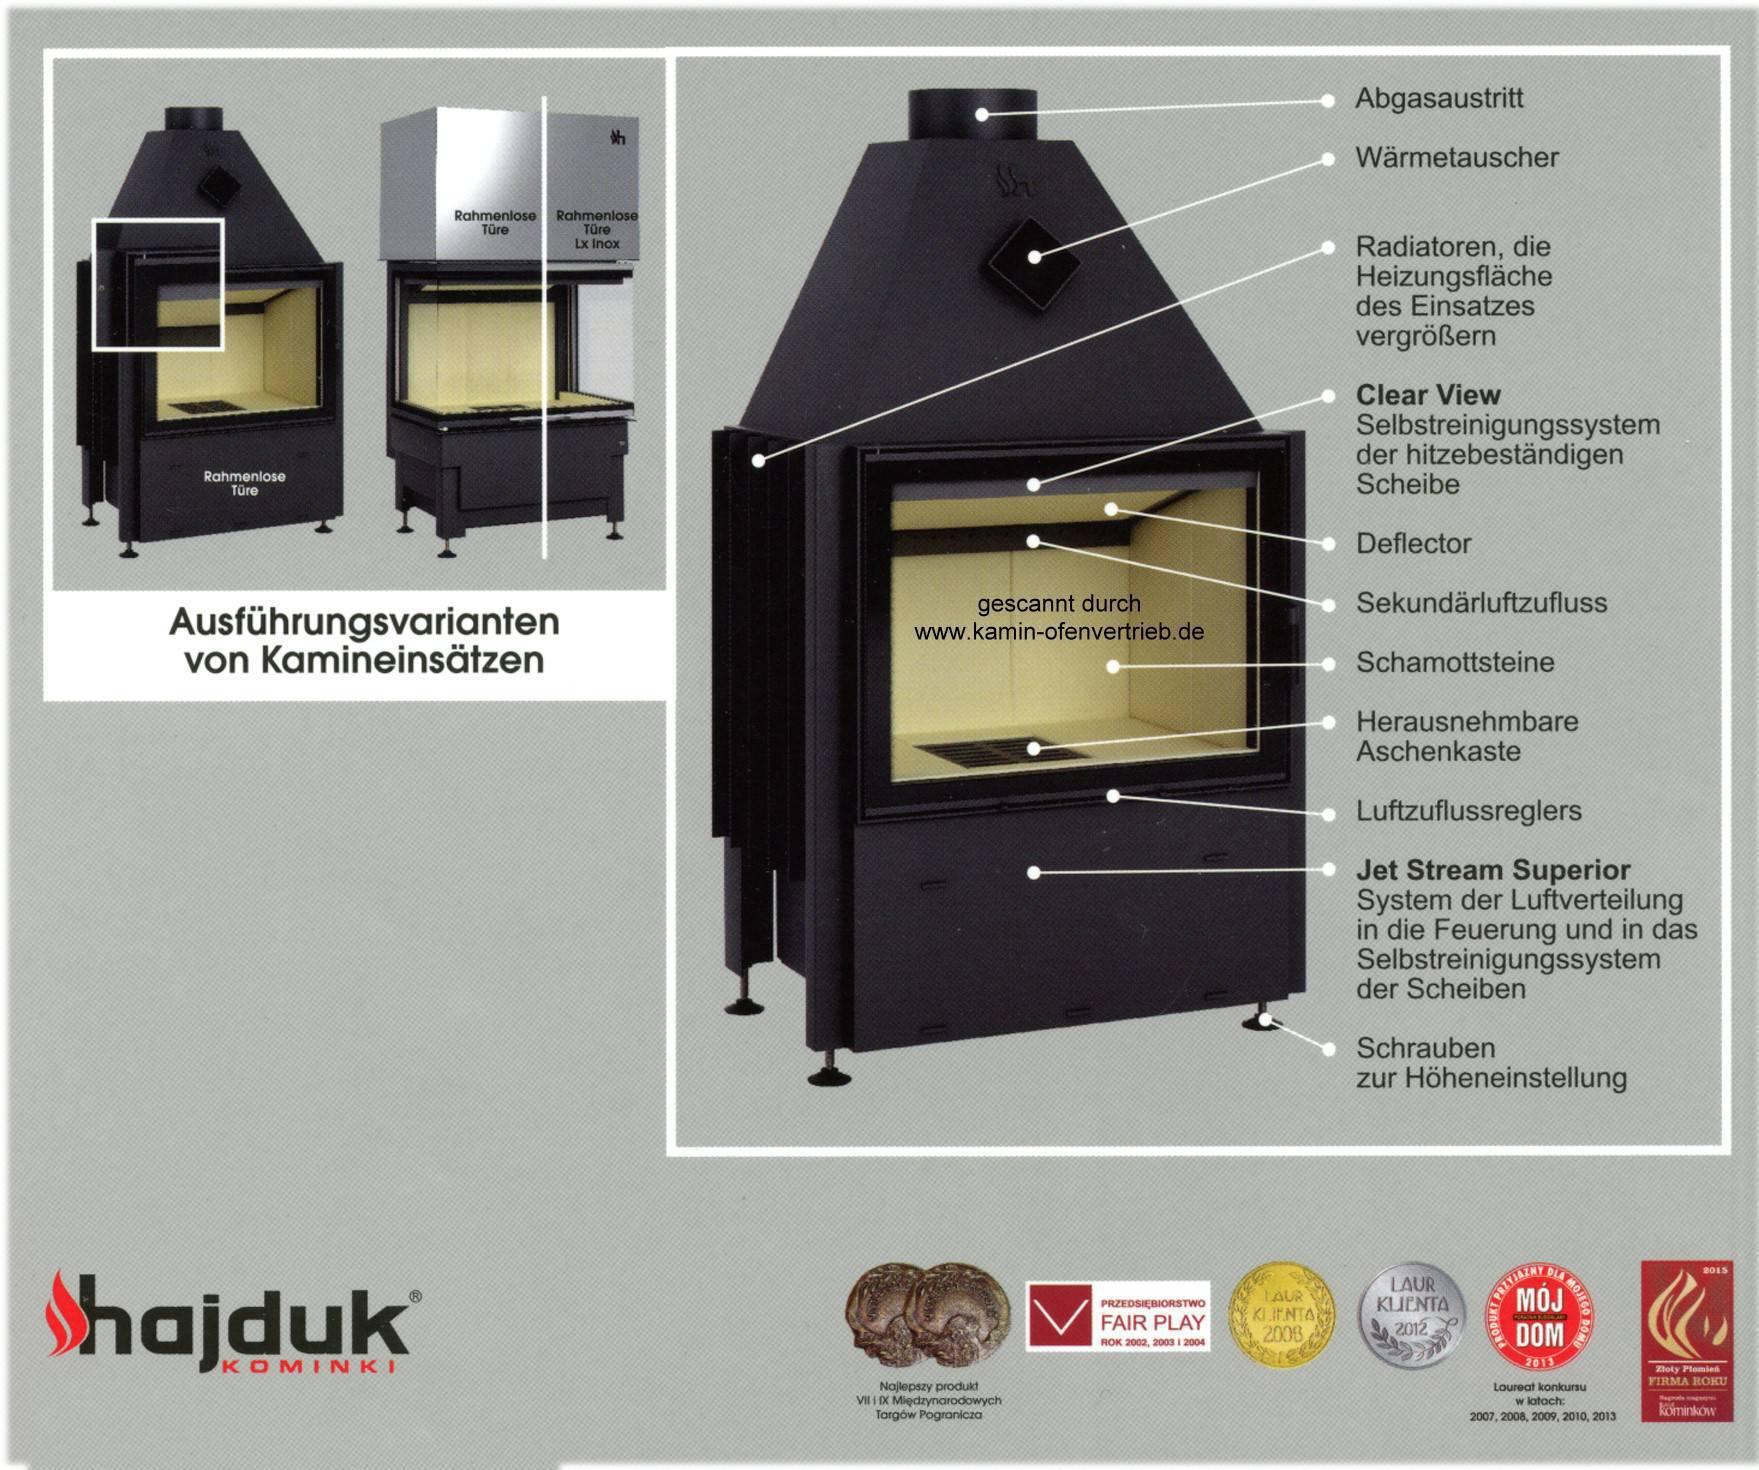 hajduk kamineinsatz prisma mh mrh 1vh 1vht 1vmh kh krh. Black Bedroom Furniture Sets. Home Design Ideas